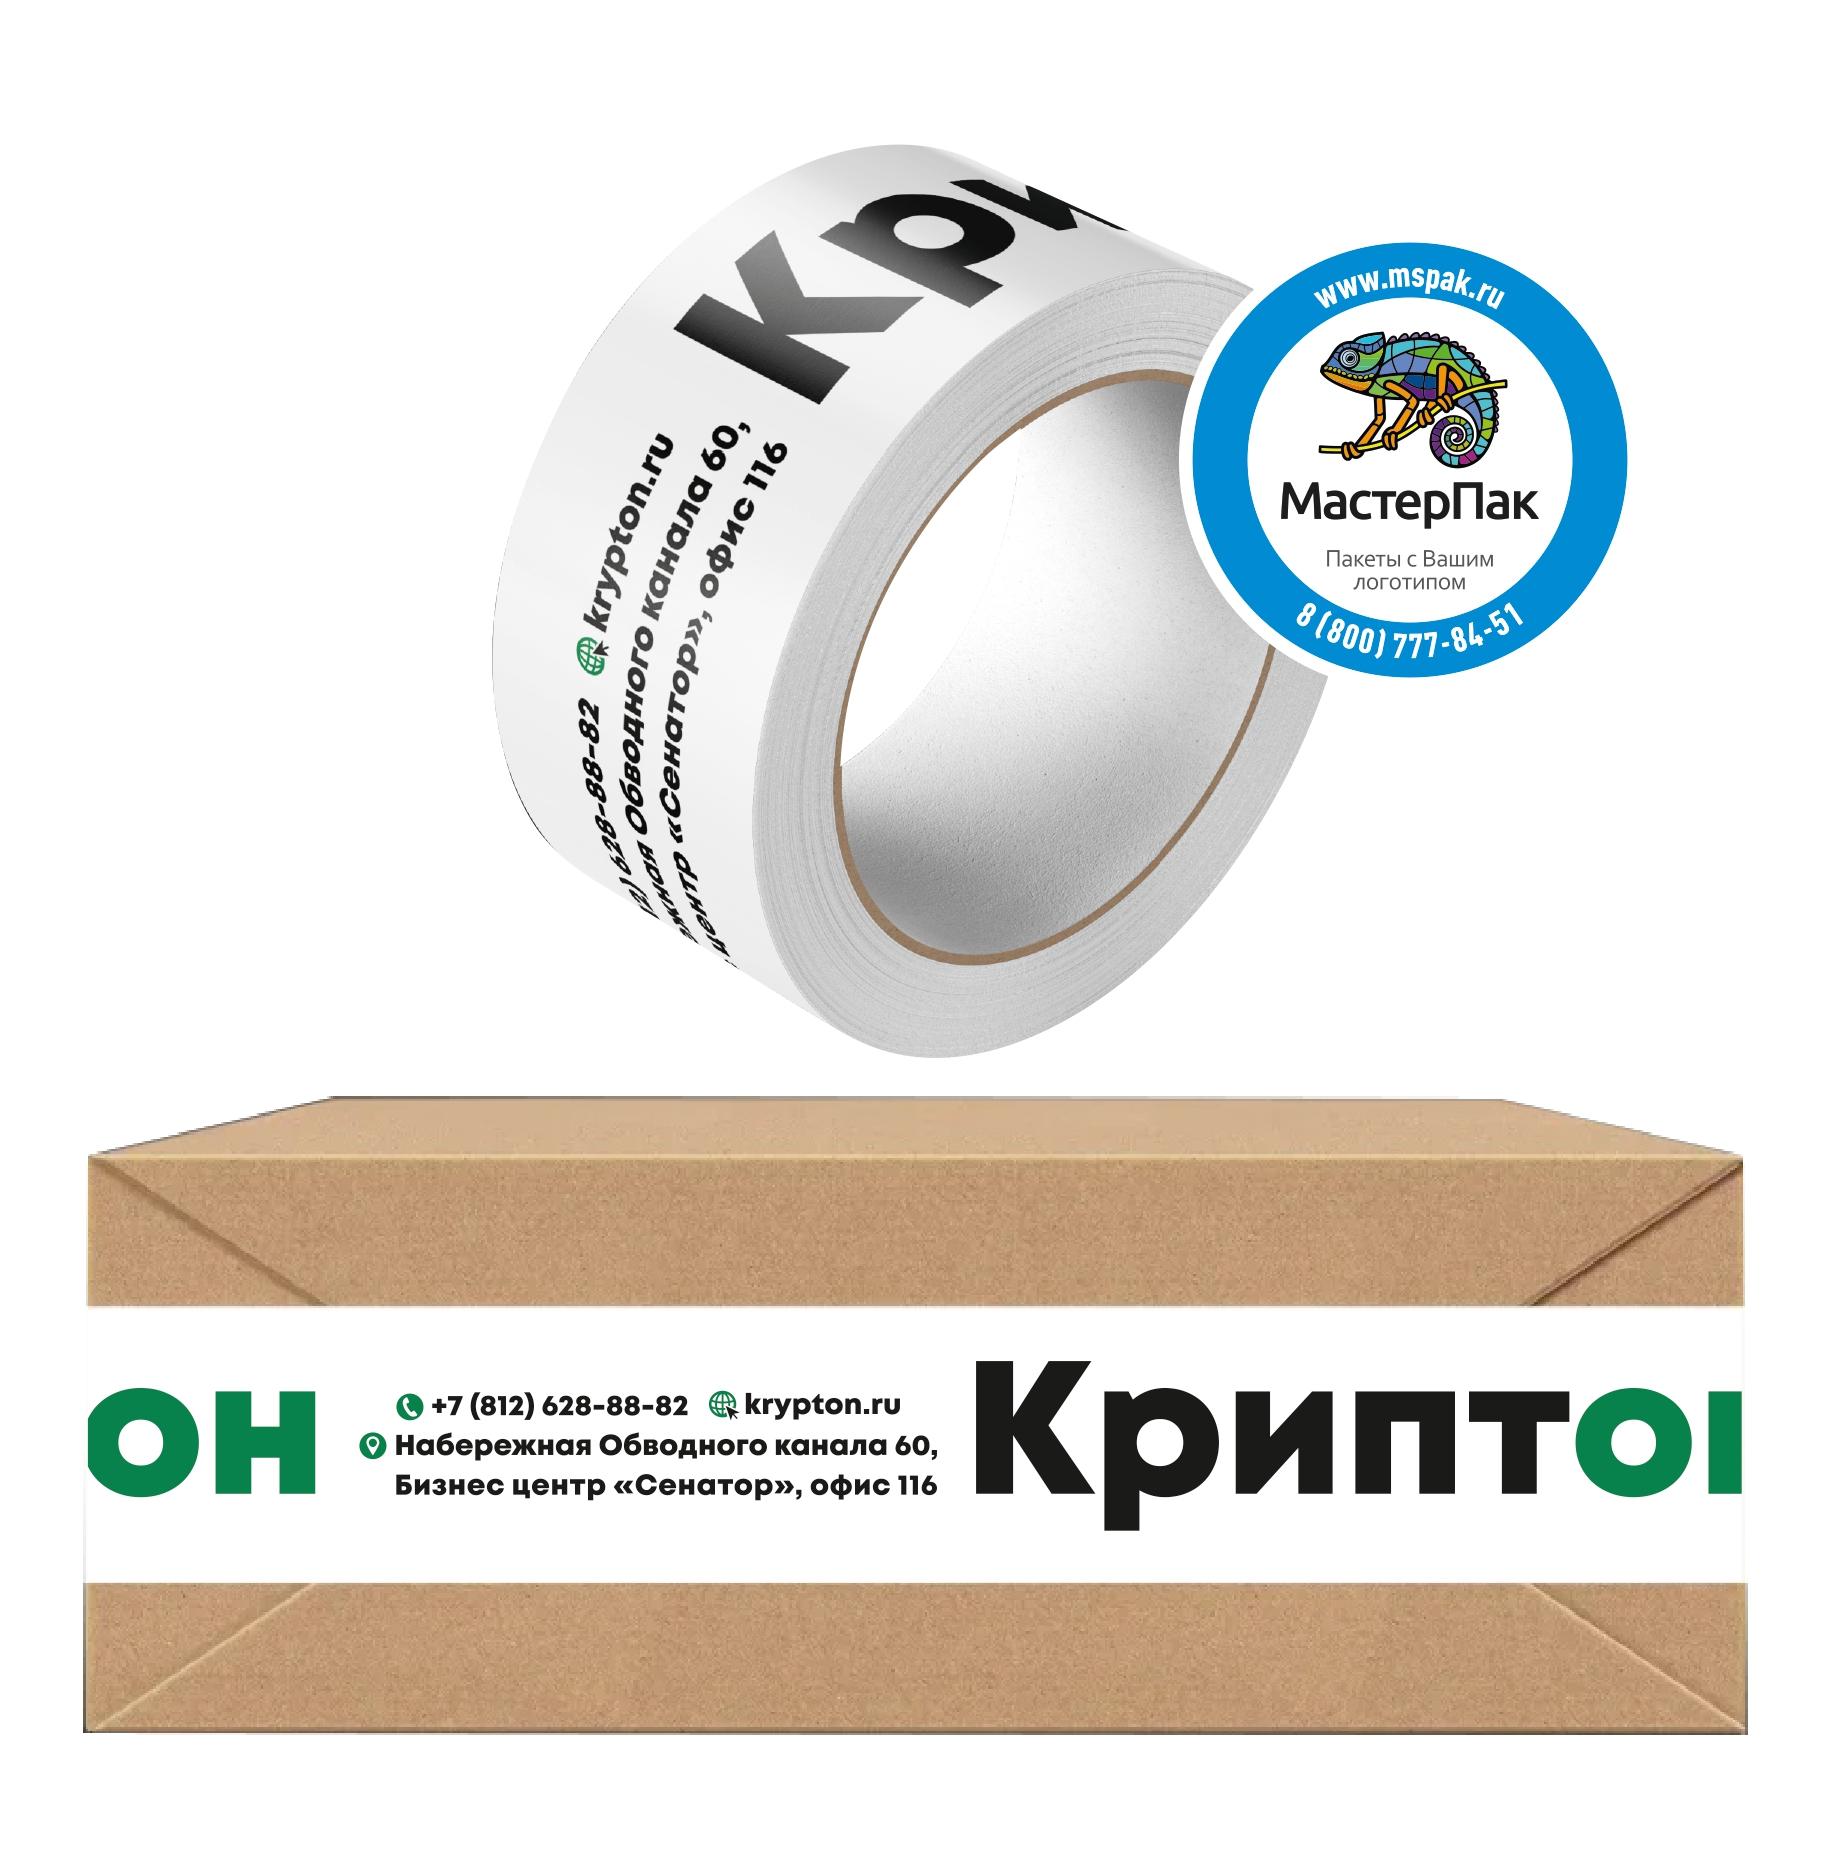 Скотч с логотипомКриптон, 63 метра, 45 мкм, Санкт-Петербург